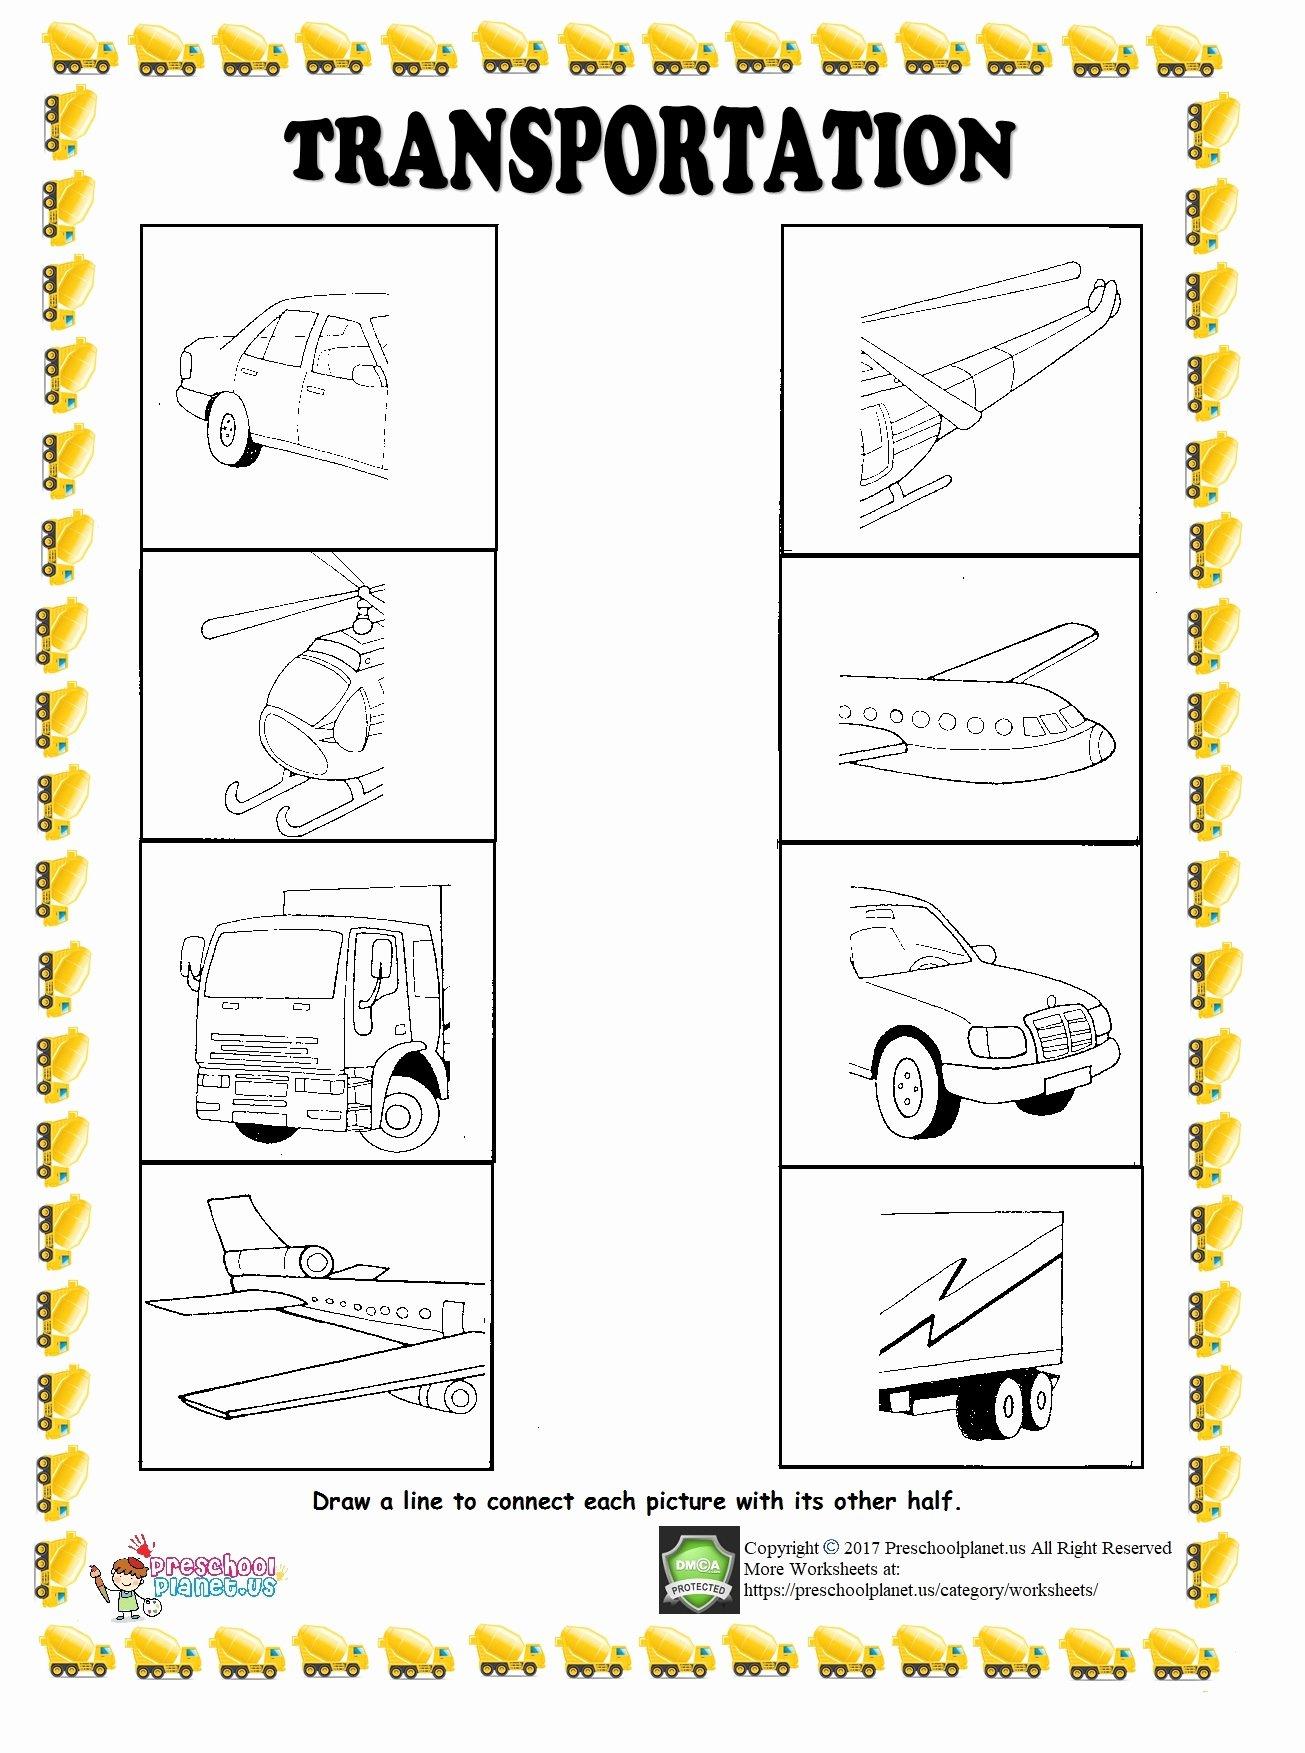 Transportation Worksheets for Preschoolers Beautiful Find Half Of Given Transportation Worksheet – Preschoolplanet